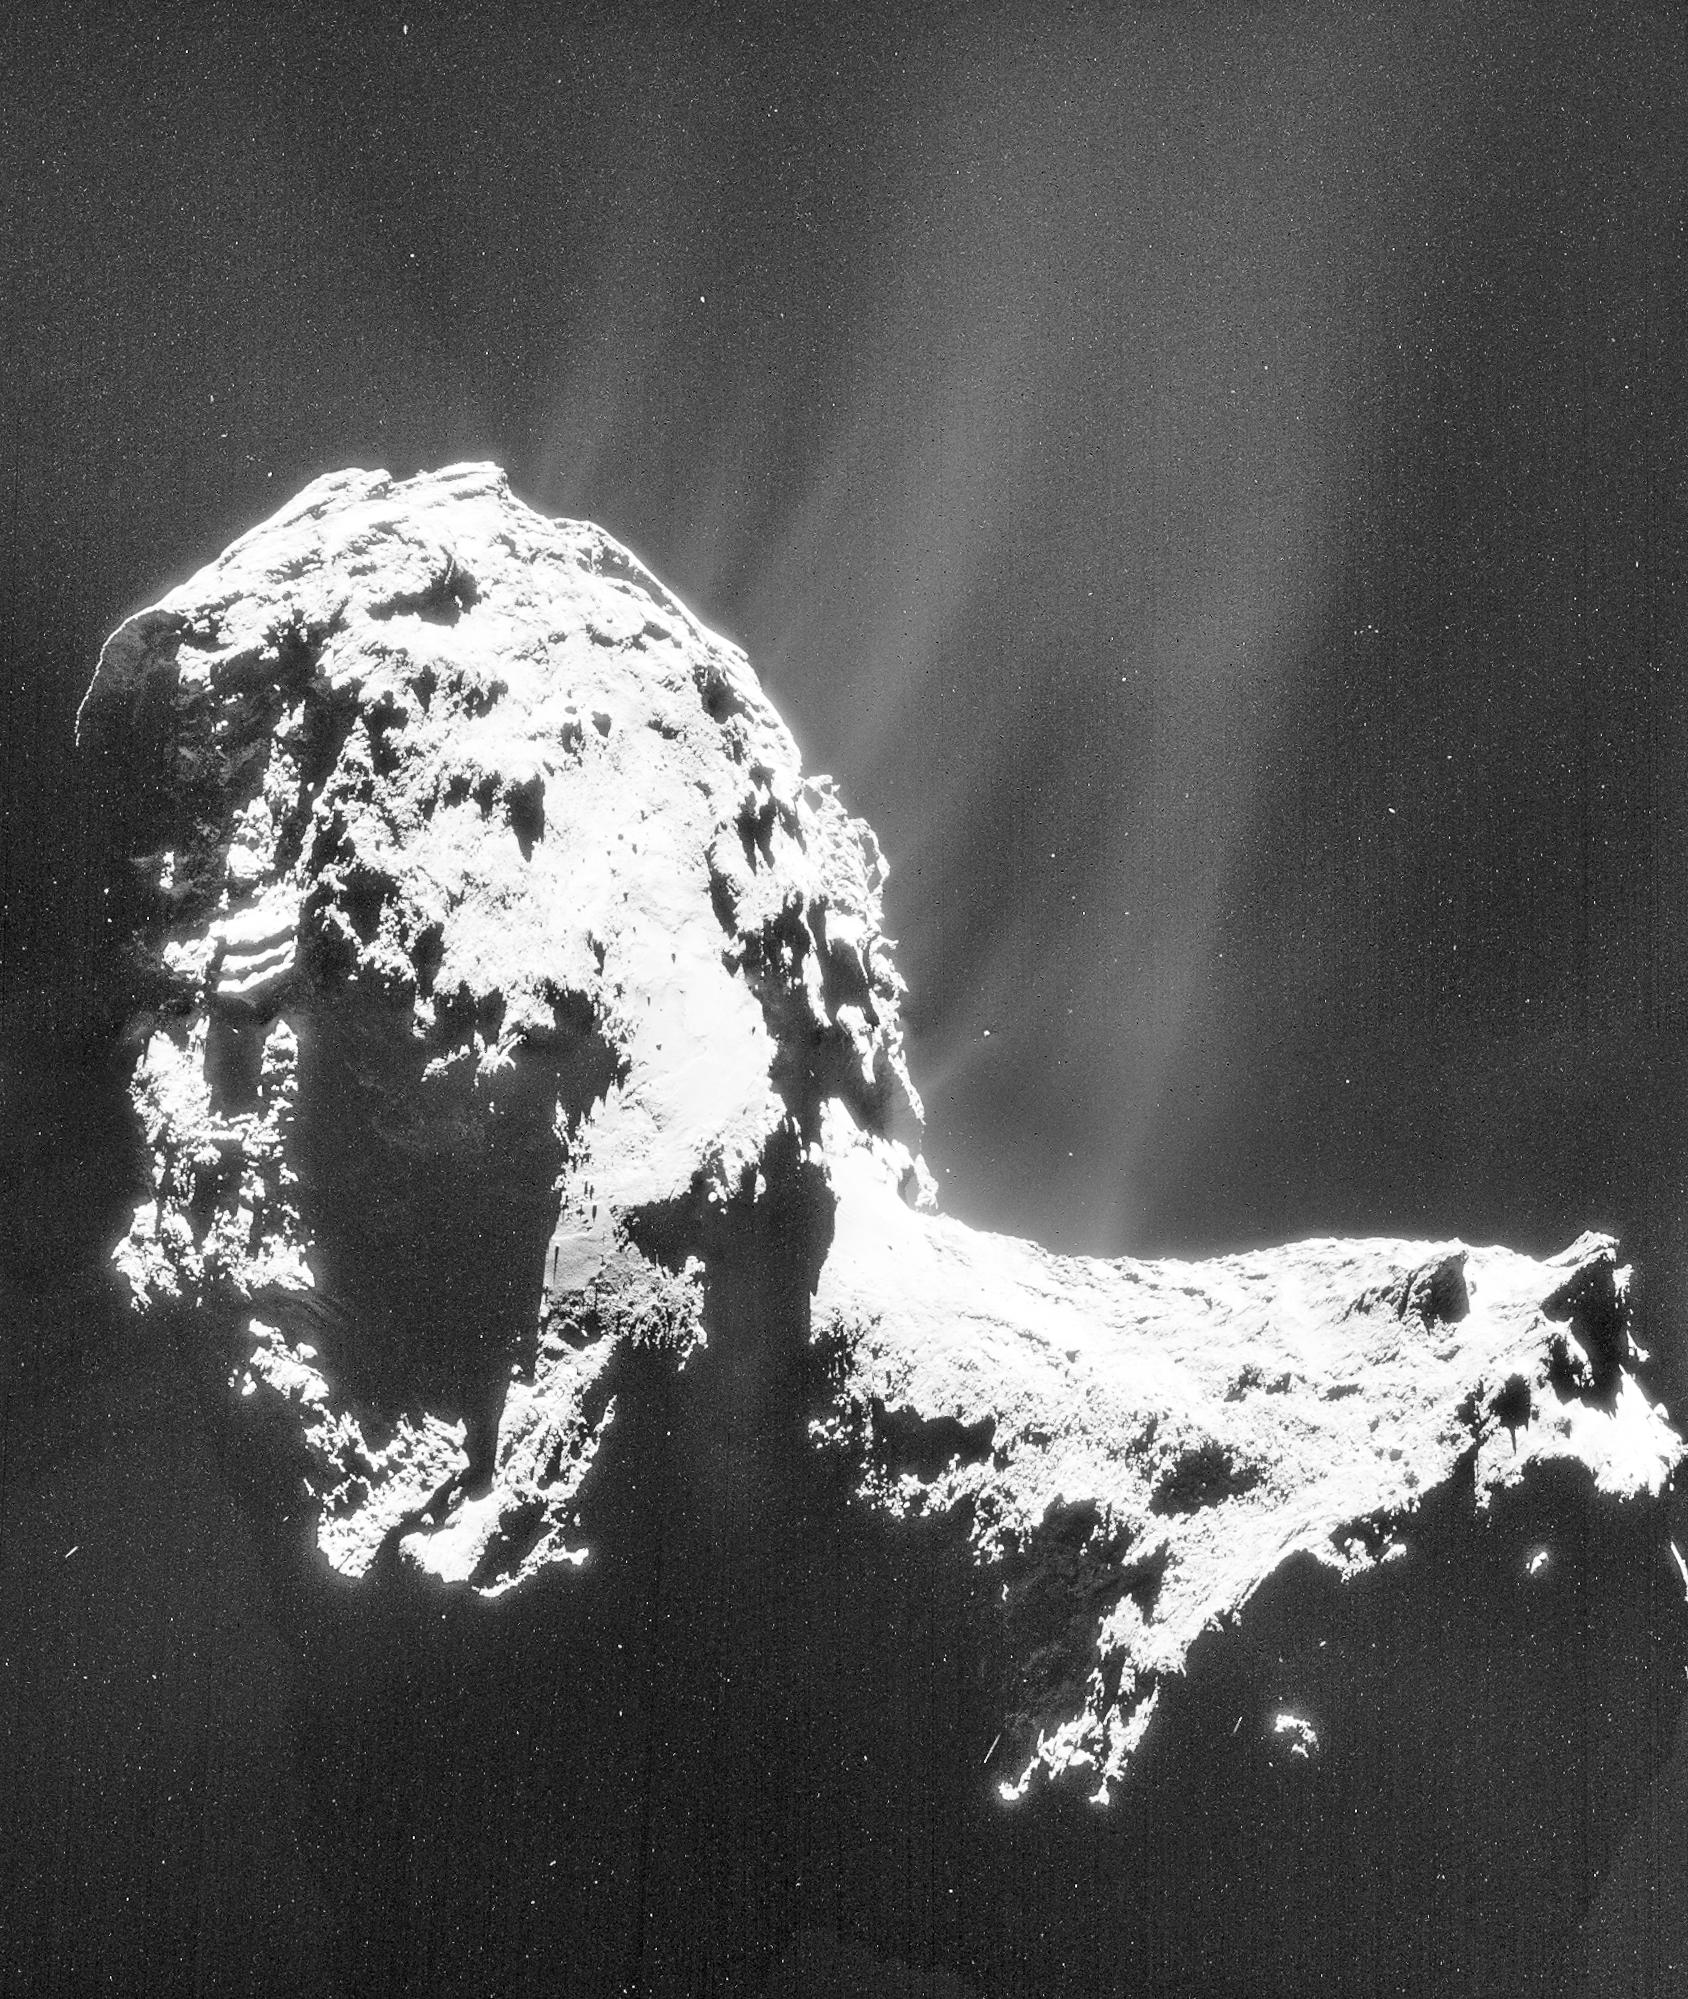 1567216555129-Rosetta_NAVCAM_comet_67P_20141120a_mosaic_stretched.jpeg